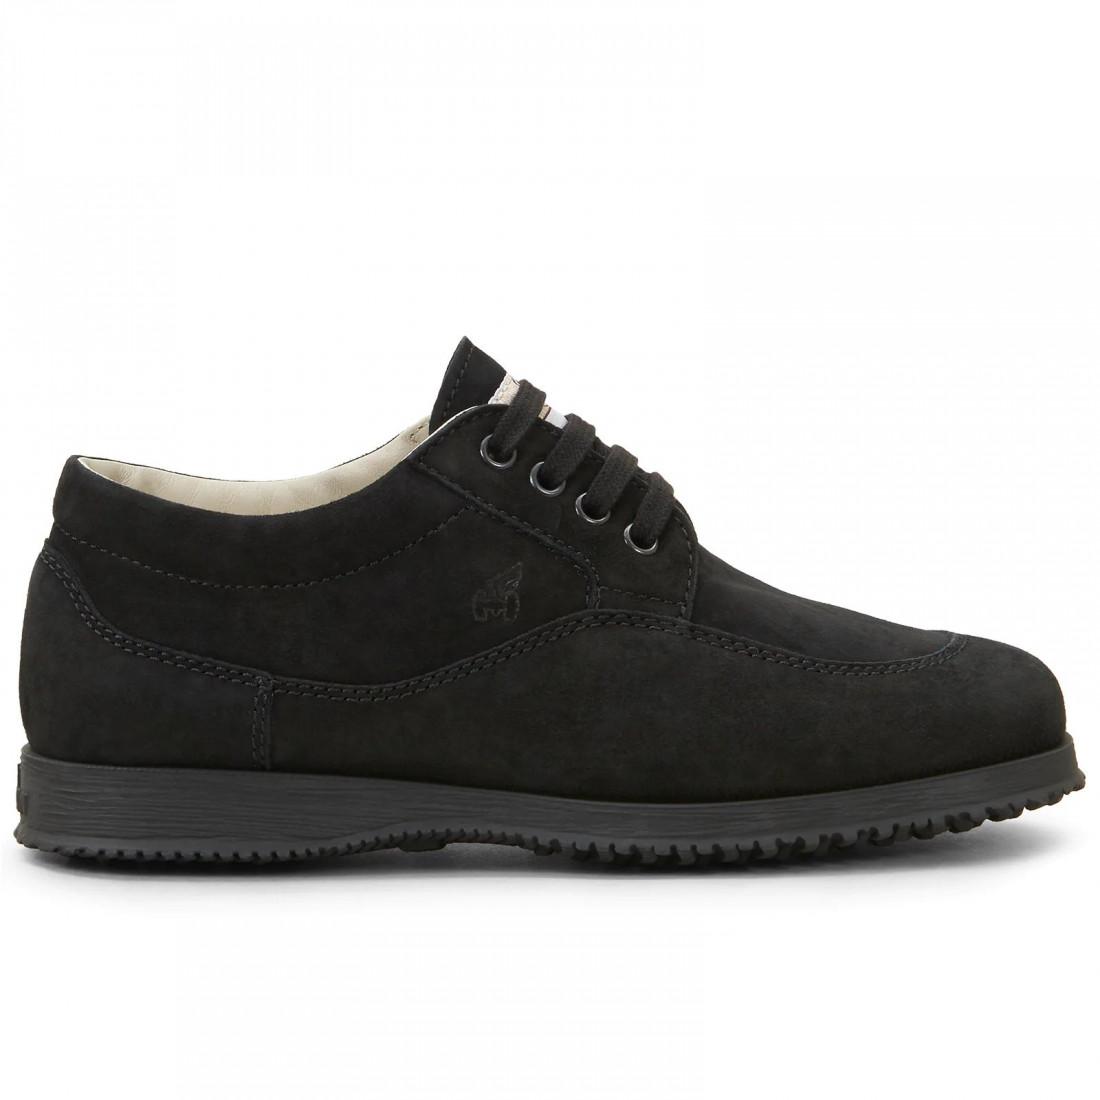 sneakers donna hogan hxw00e00010cr0b999 7552